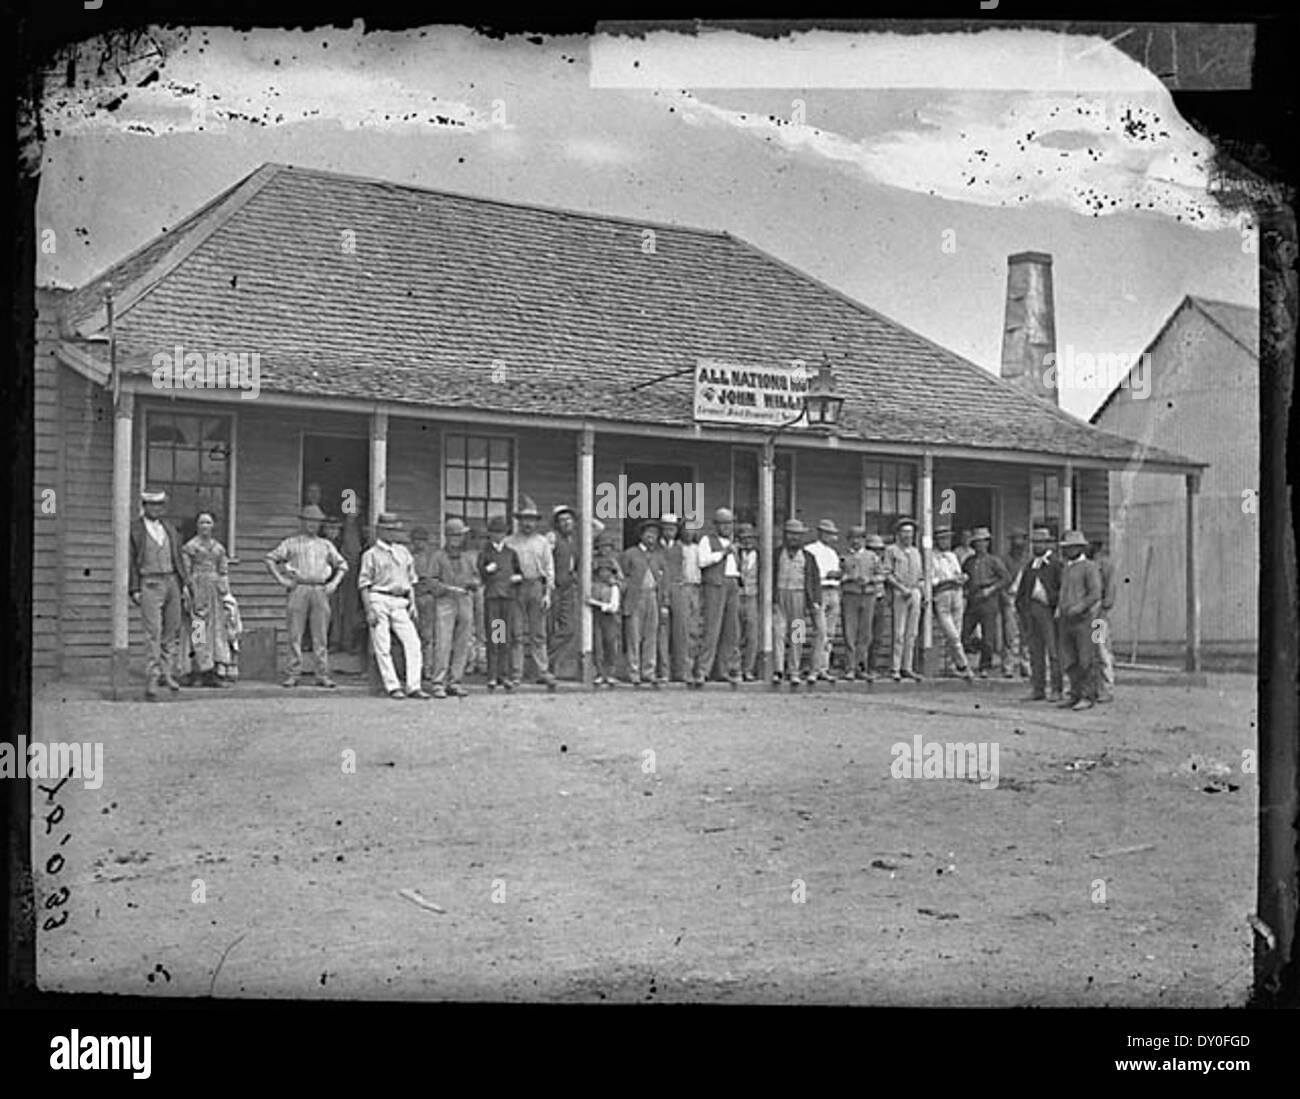 All Nations Hotel (J. Williams proprietor), Clarke Street, Hill End, 1871-1875 / American & Australasian Photographic Company - Stock Image